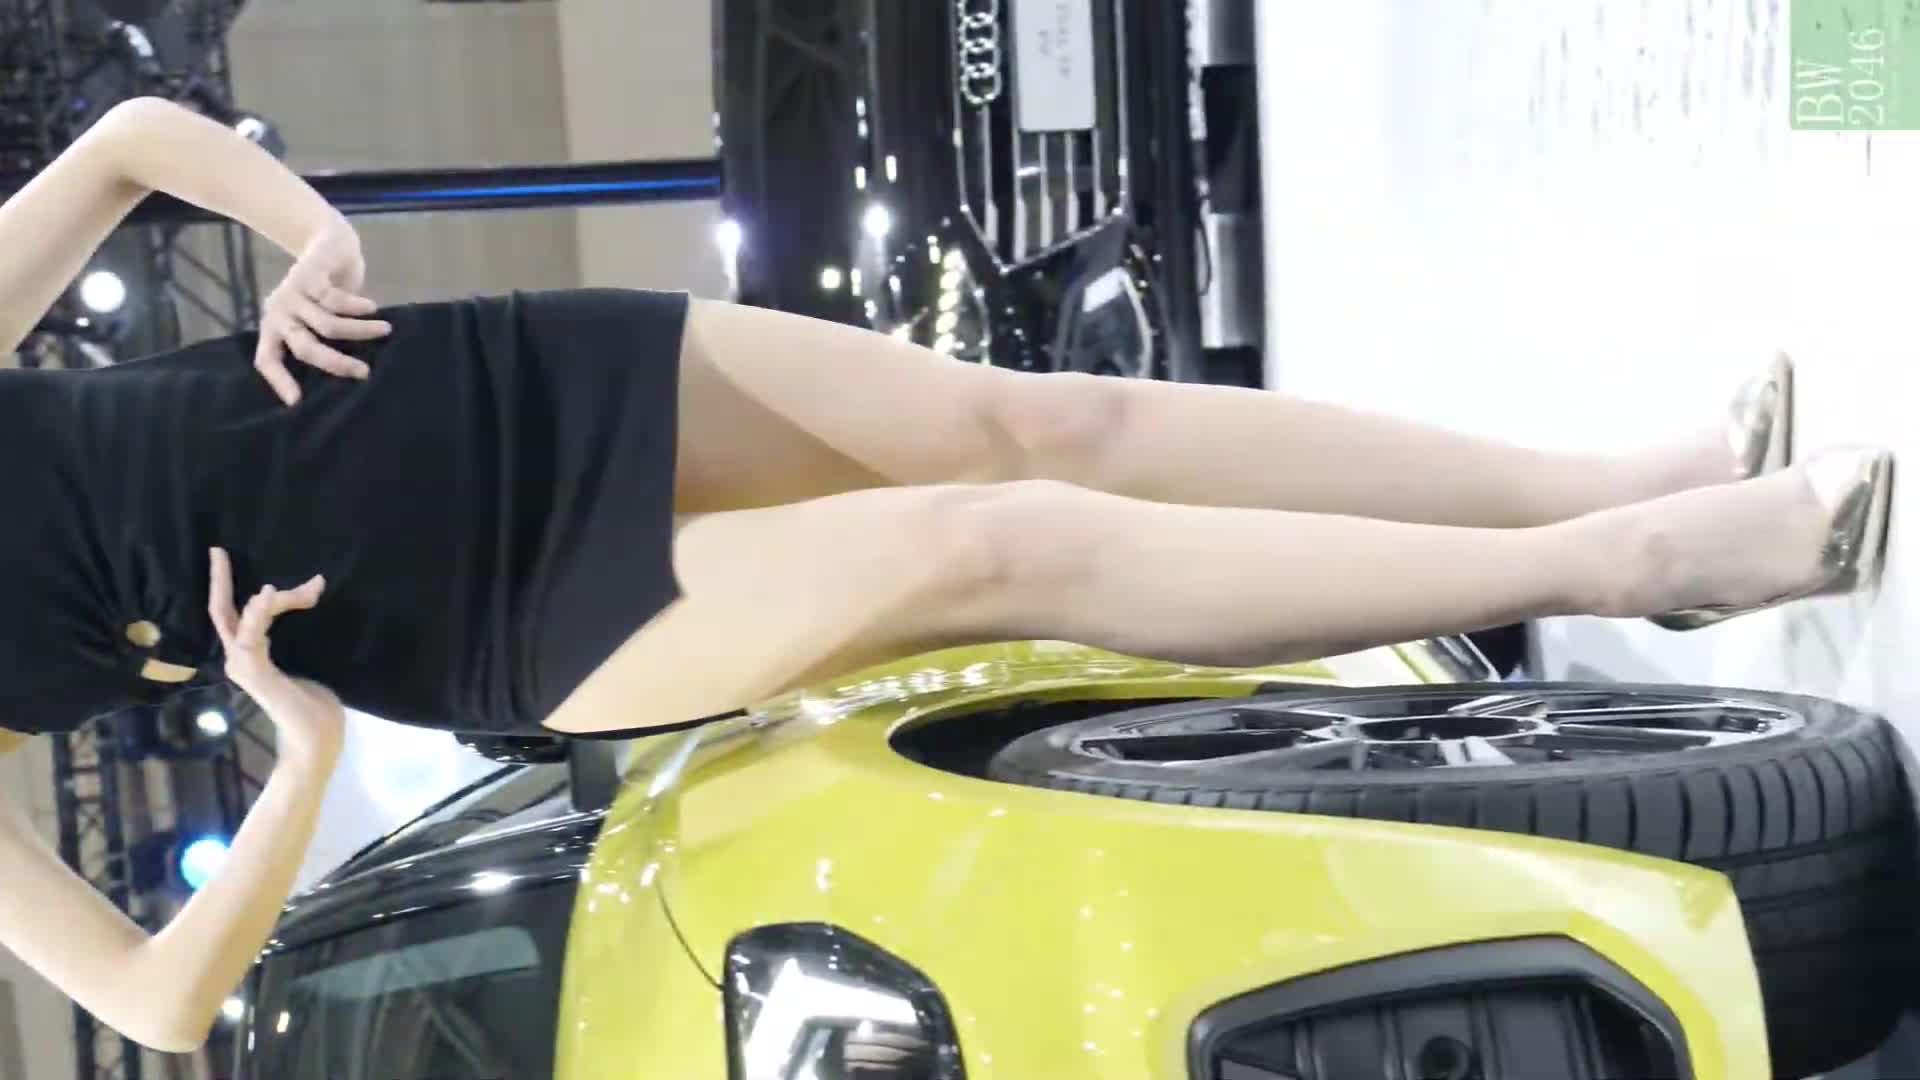 世界新車大展 - 台北車展 | Taipei Auto Show 2020 - 車模 #27 ChaCha宇晴 @ Audi Taiwan (Mobile Version)